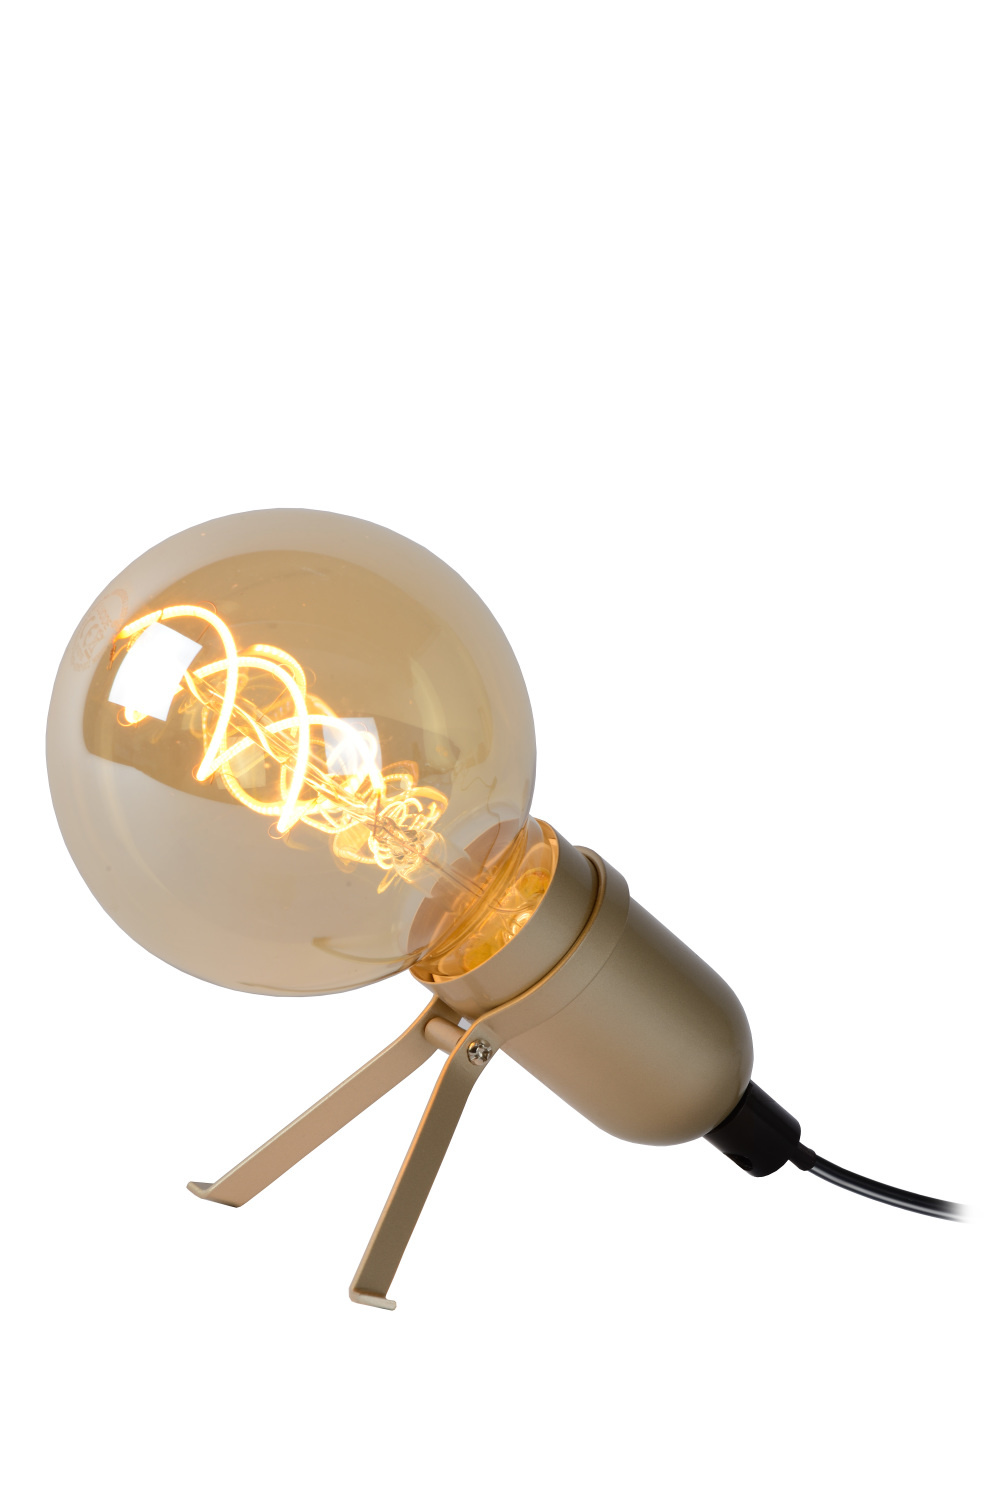 Lucide PUKKI Tafellamp-Mat Go.-LED-1xE27-5W-2200K-Metaal